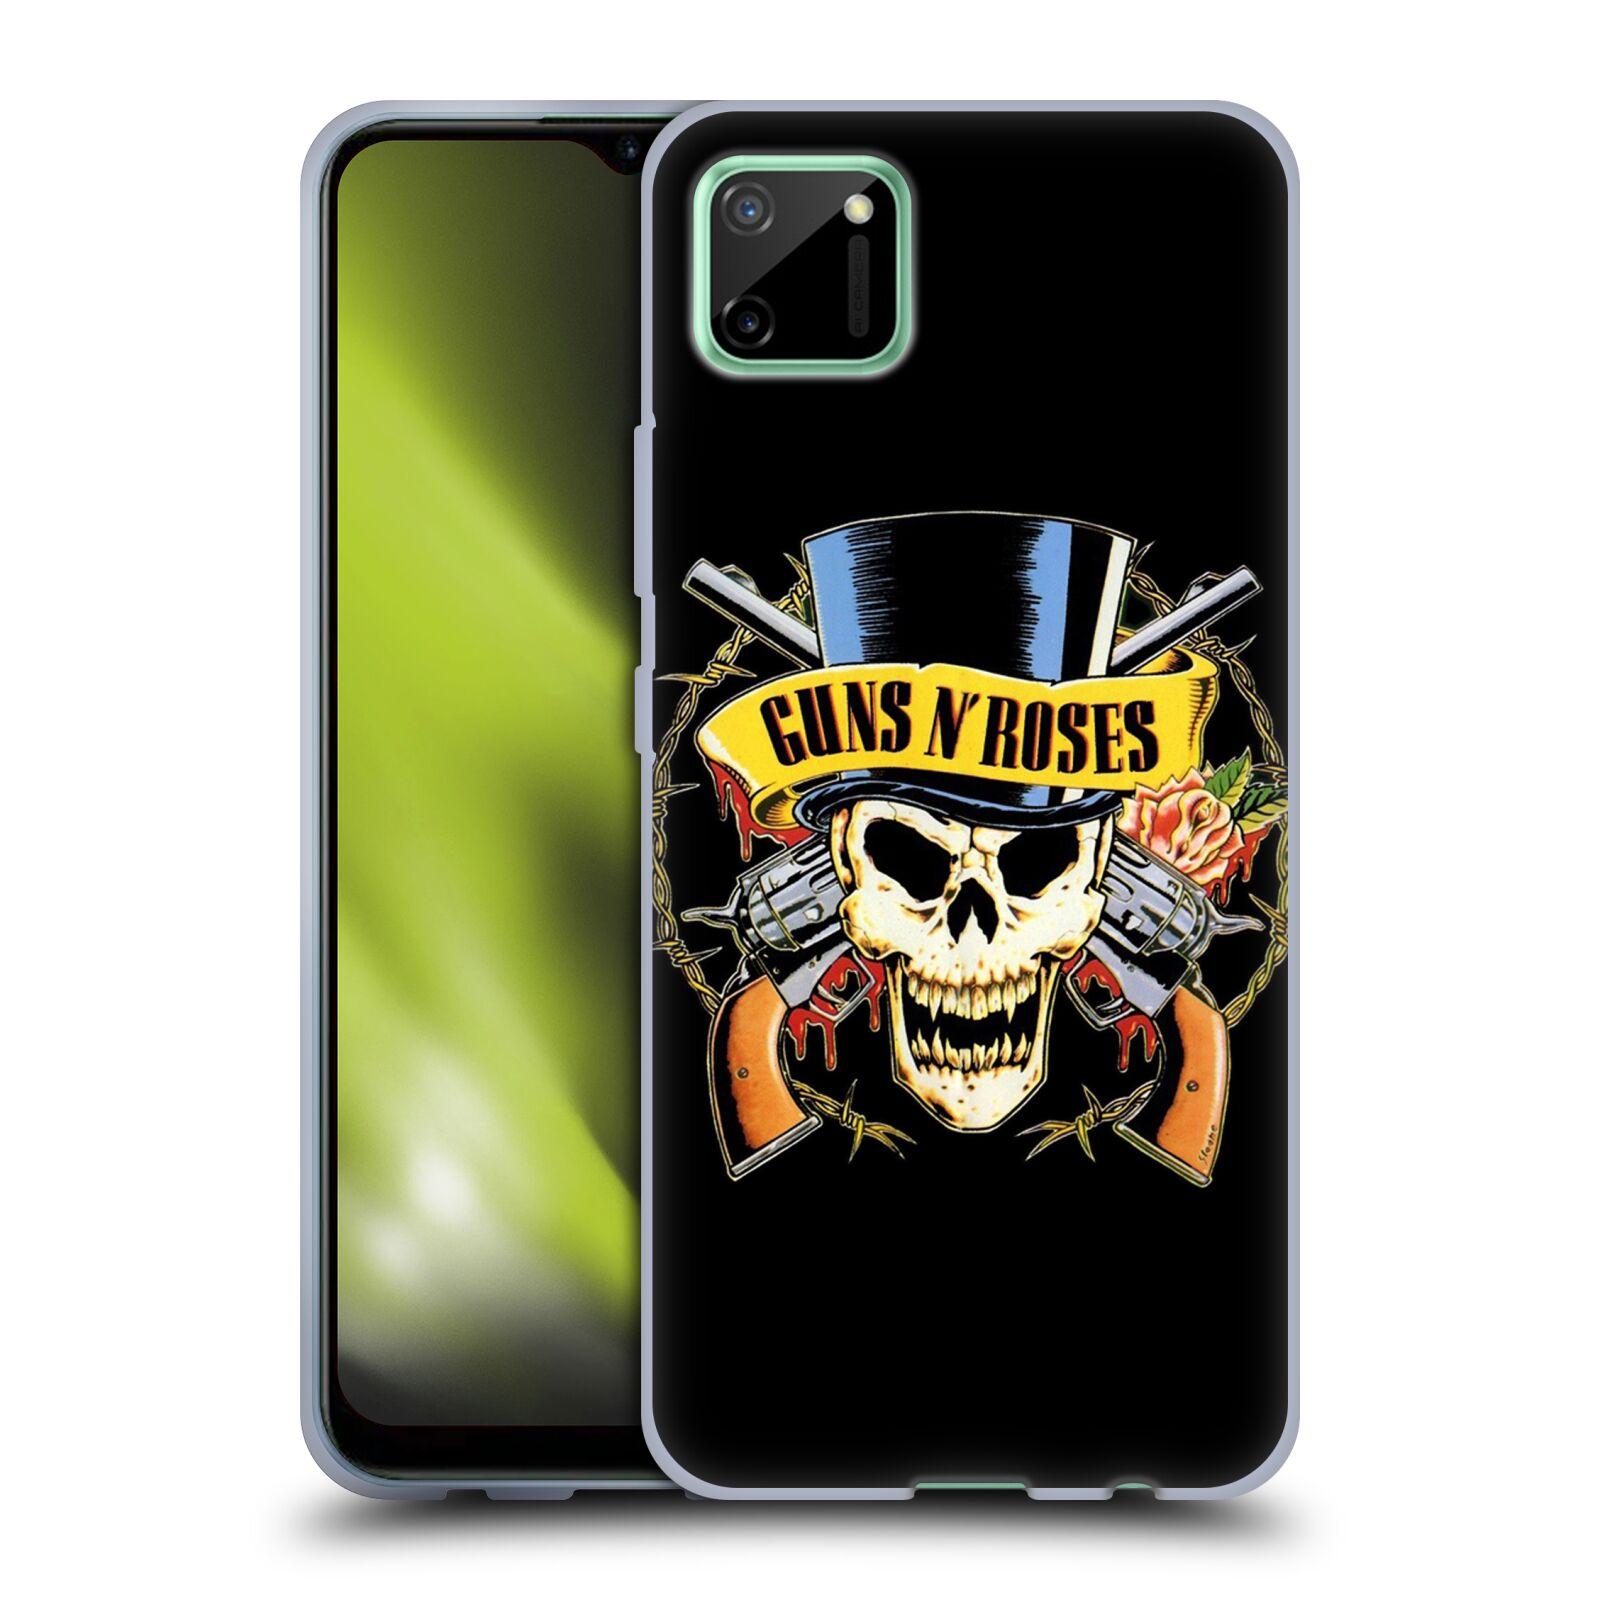 Silikonové pouzdro na mobil Realme C11 - Head Case - Guns N' Roses - Lebka